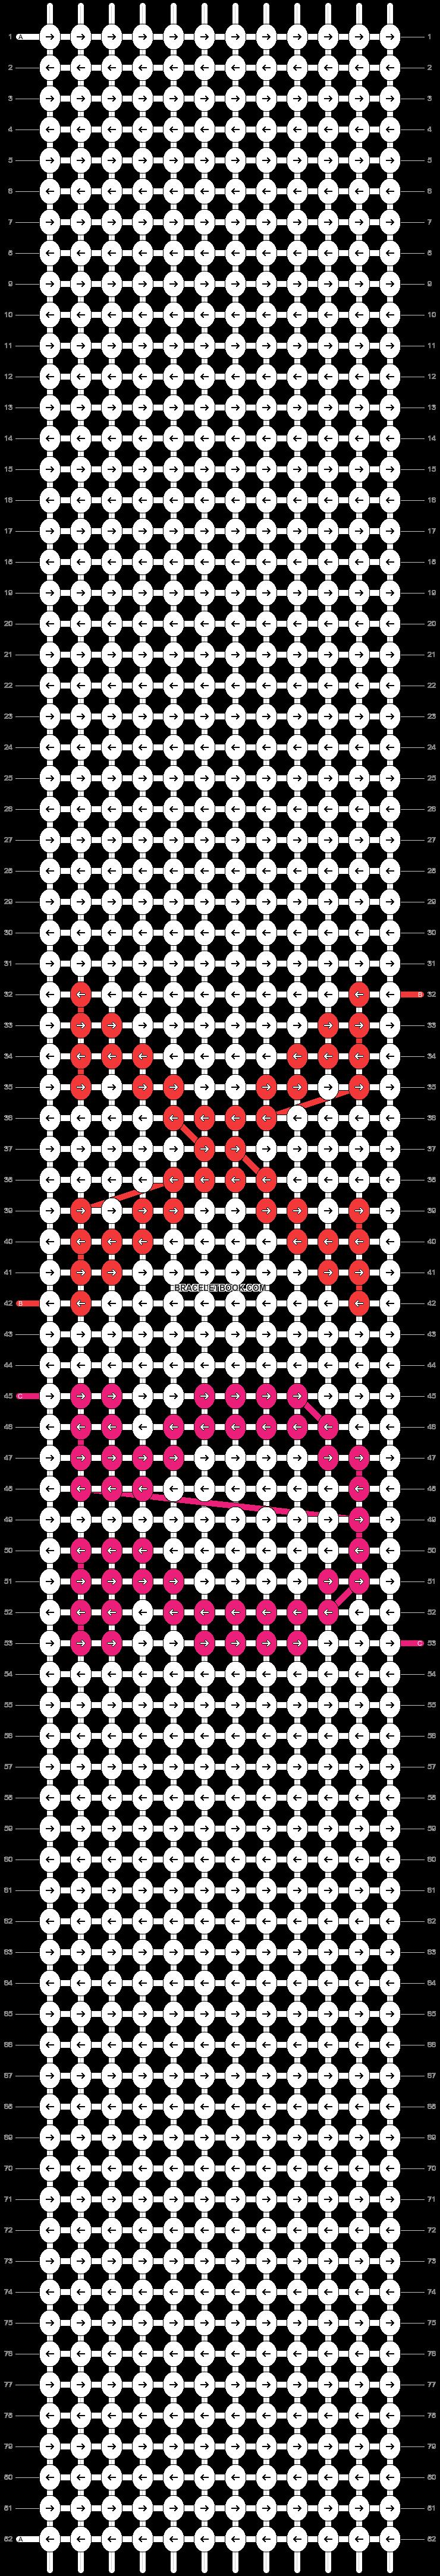 Alpha pattern #54482 pattern